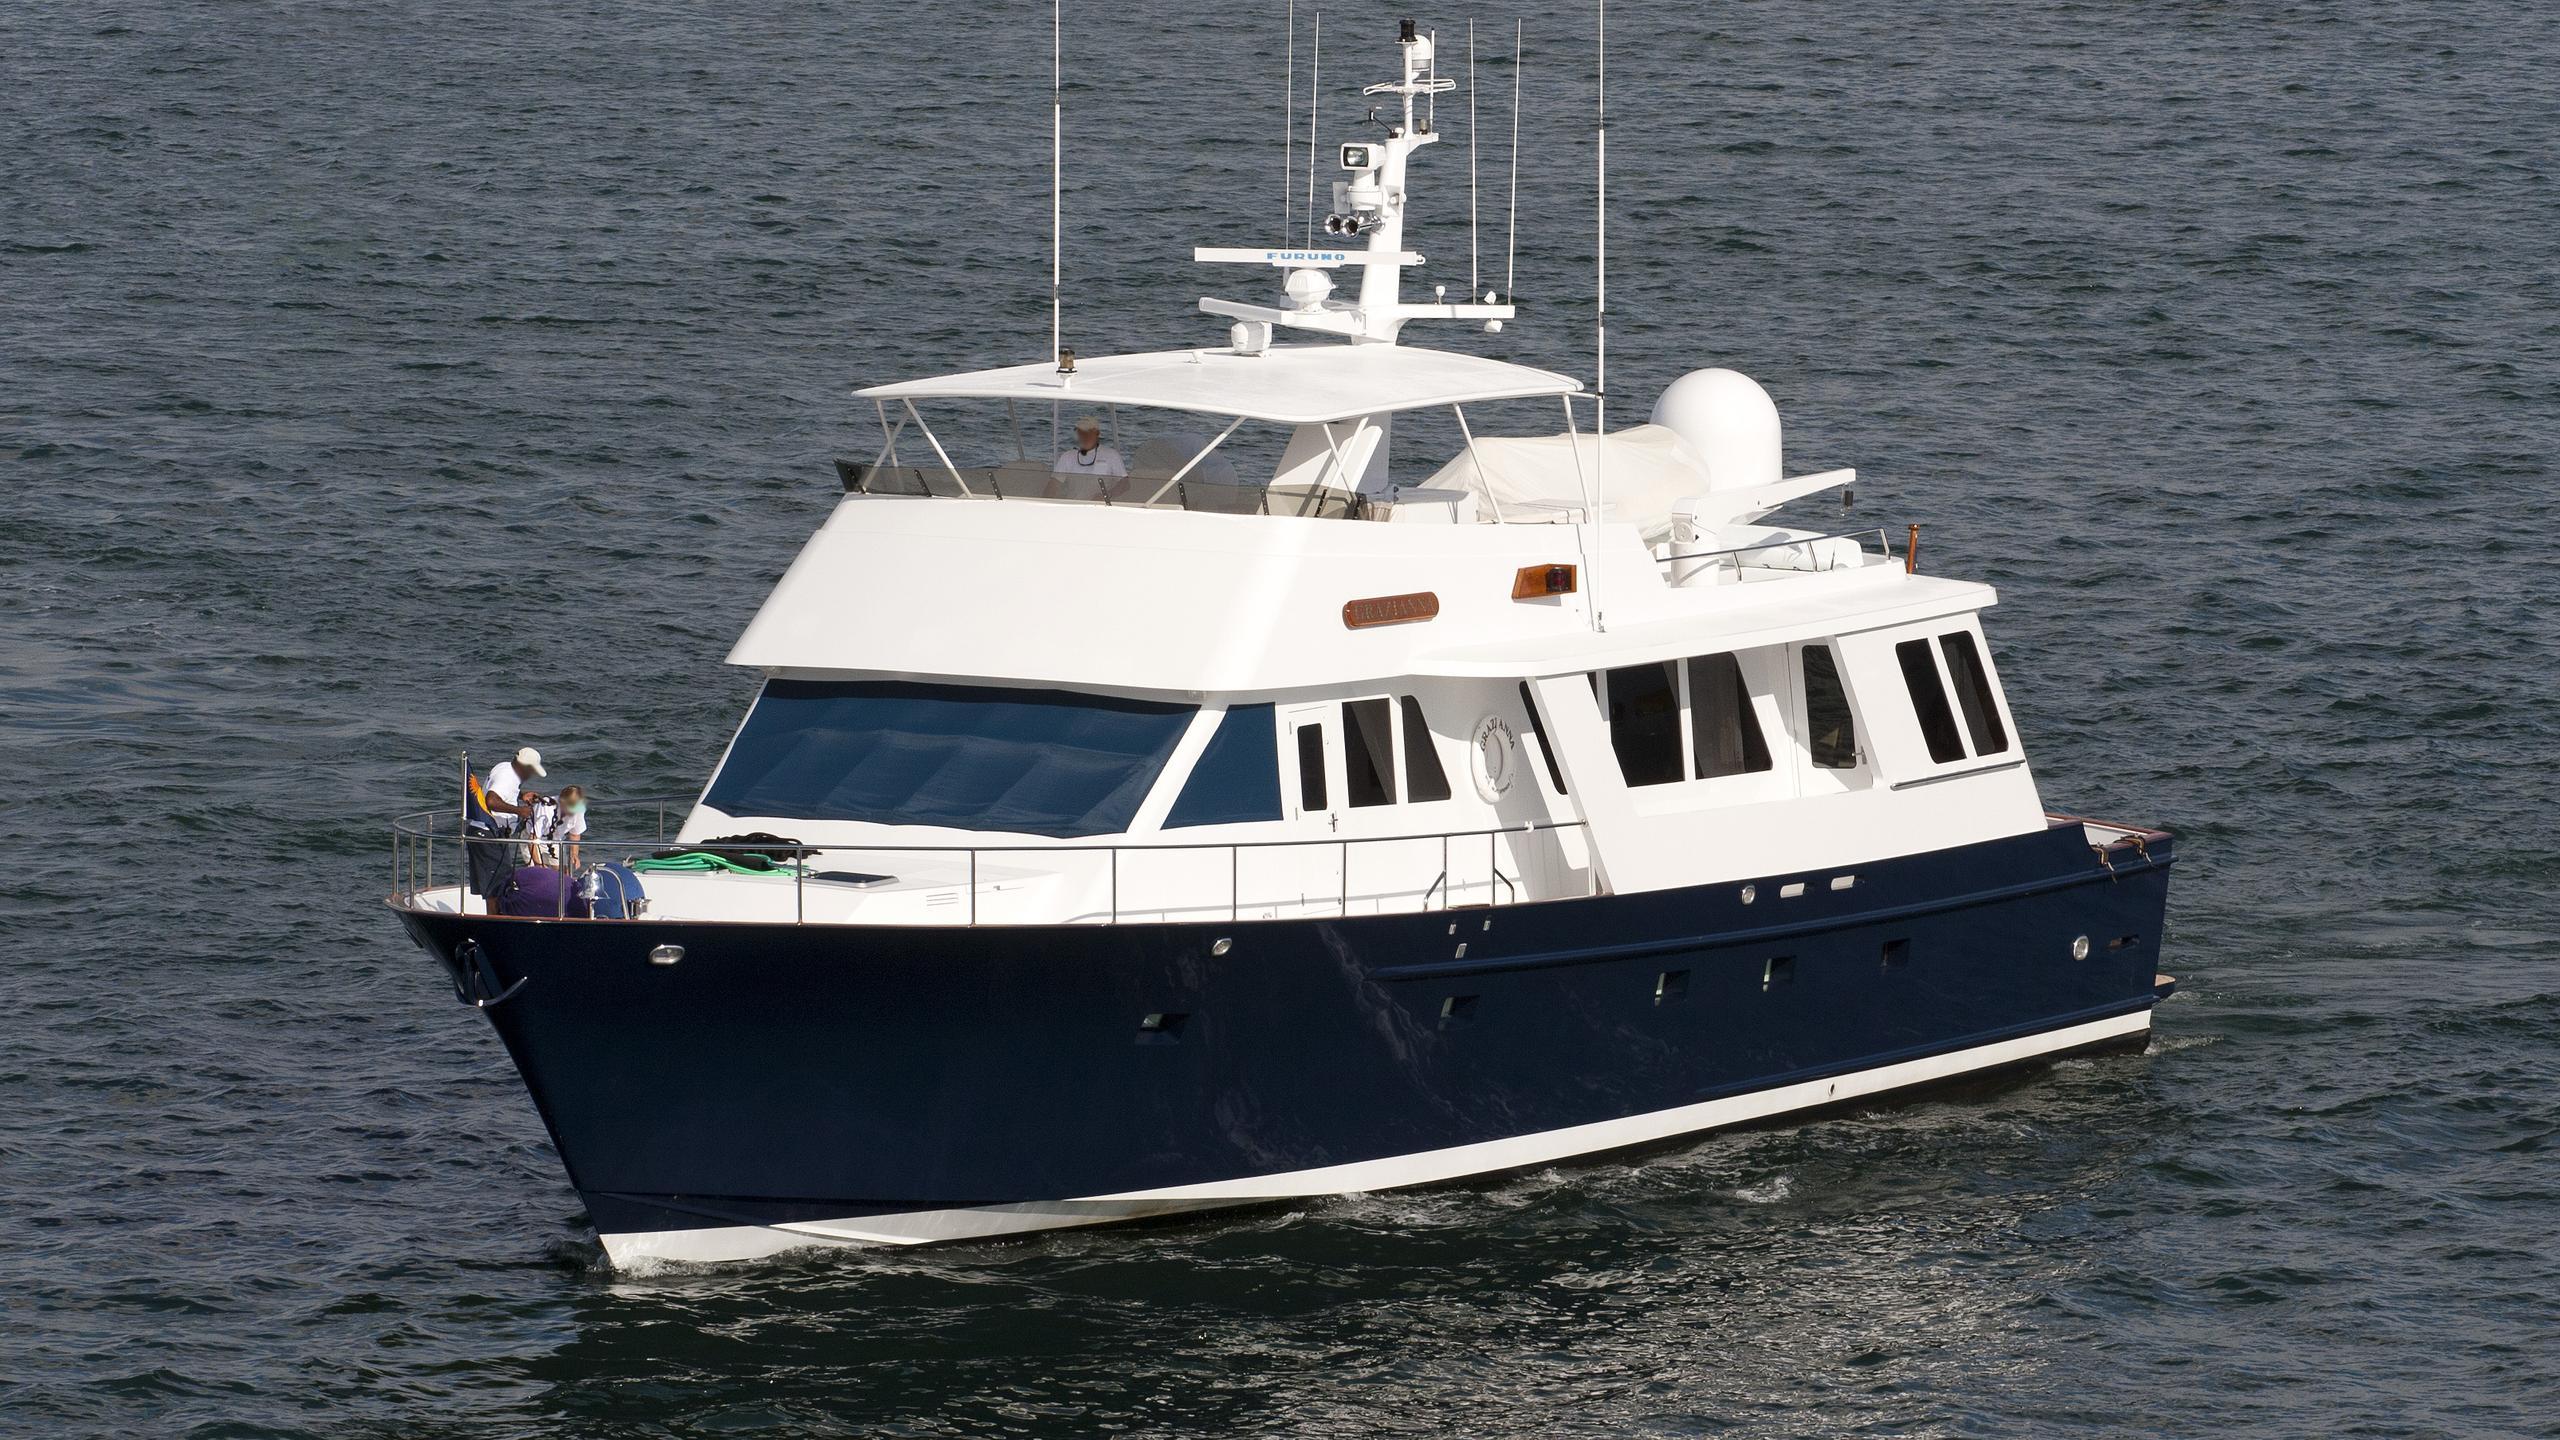 nirvana-grazianna-motor-yacht-palmer-johnson-1999-28m-half-profile